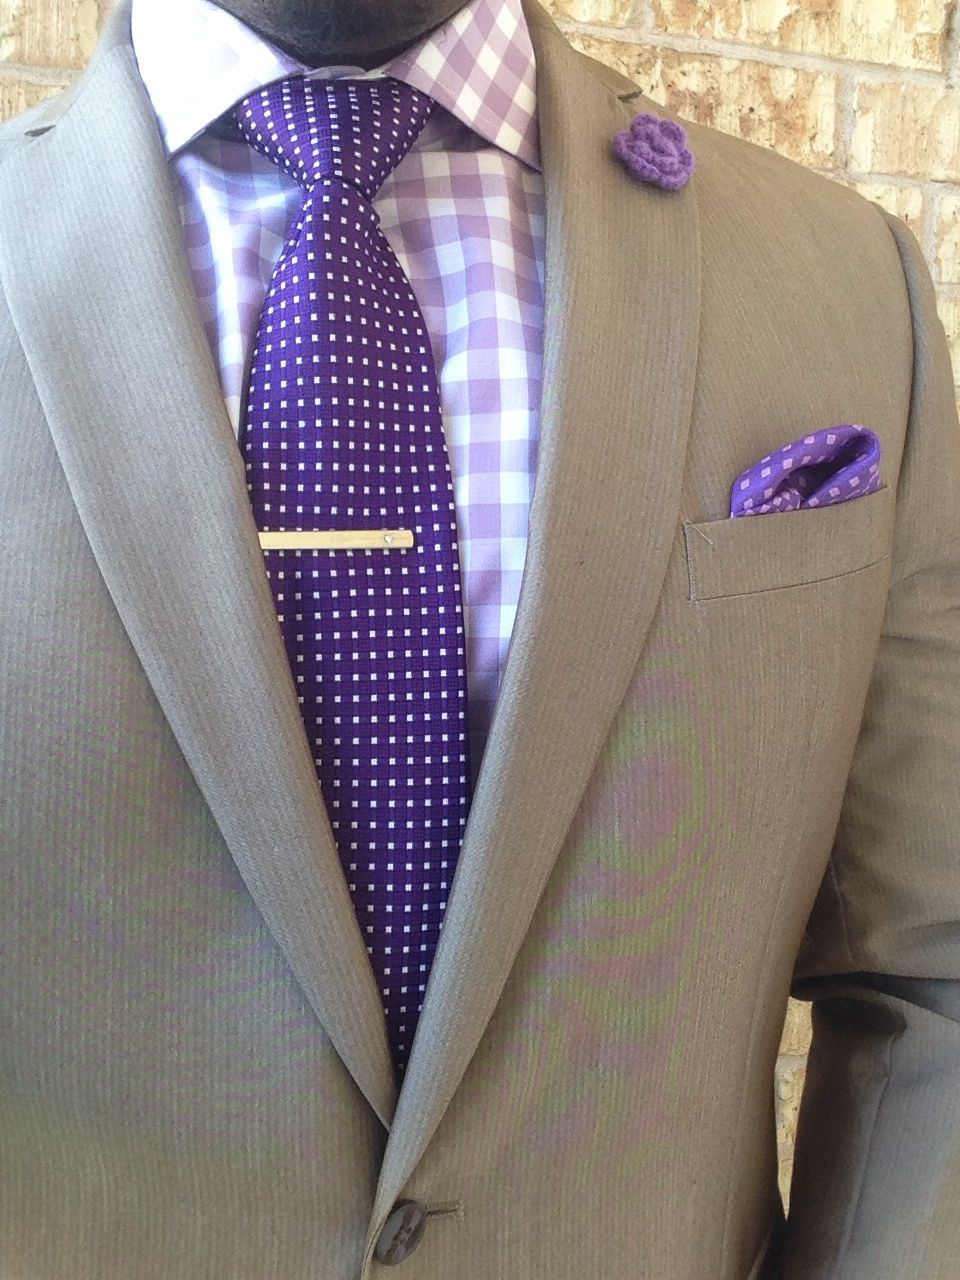 #Shades of purple